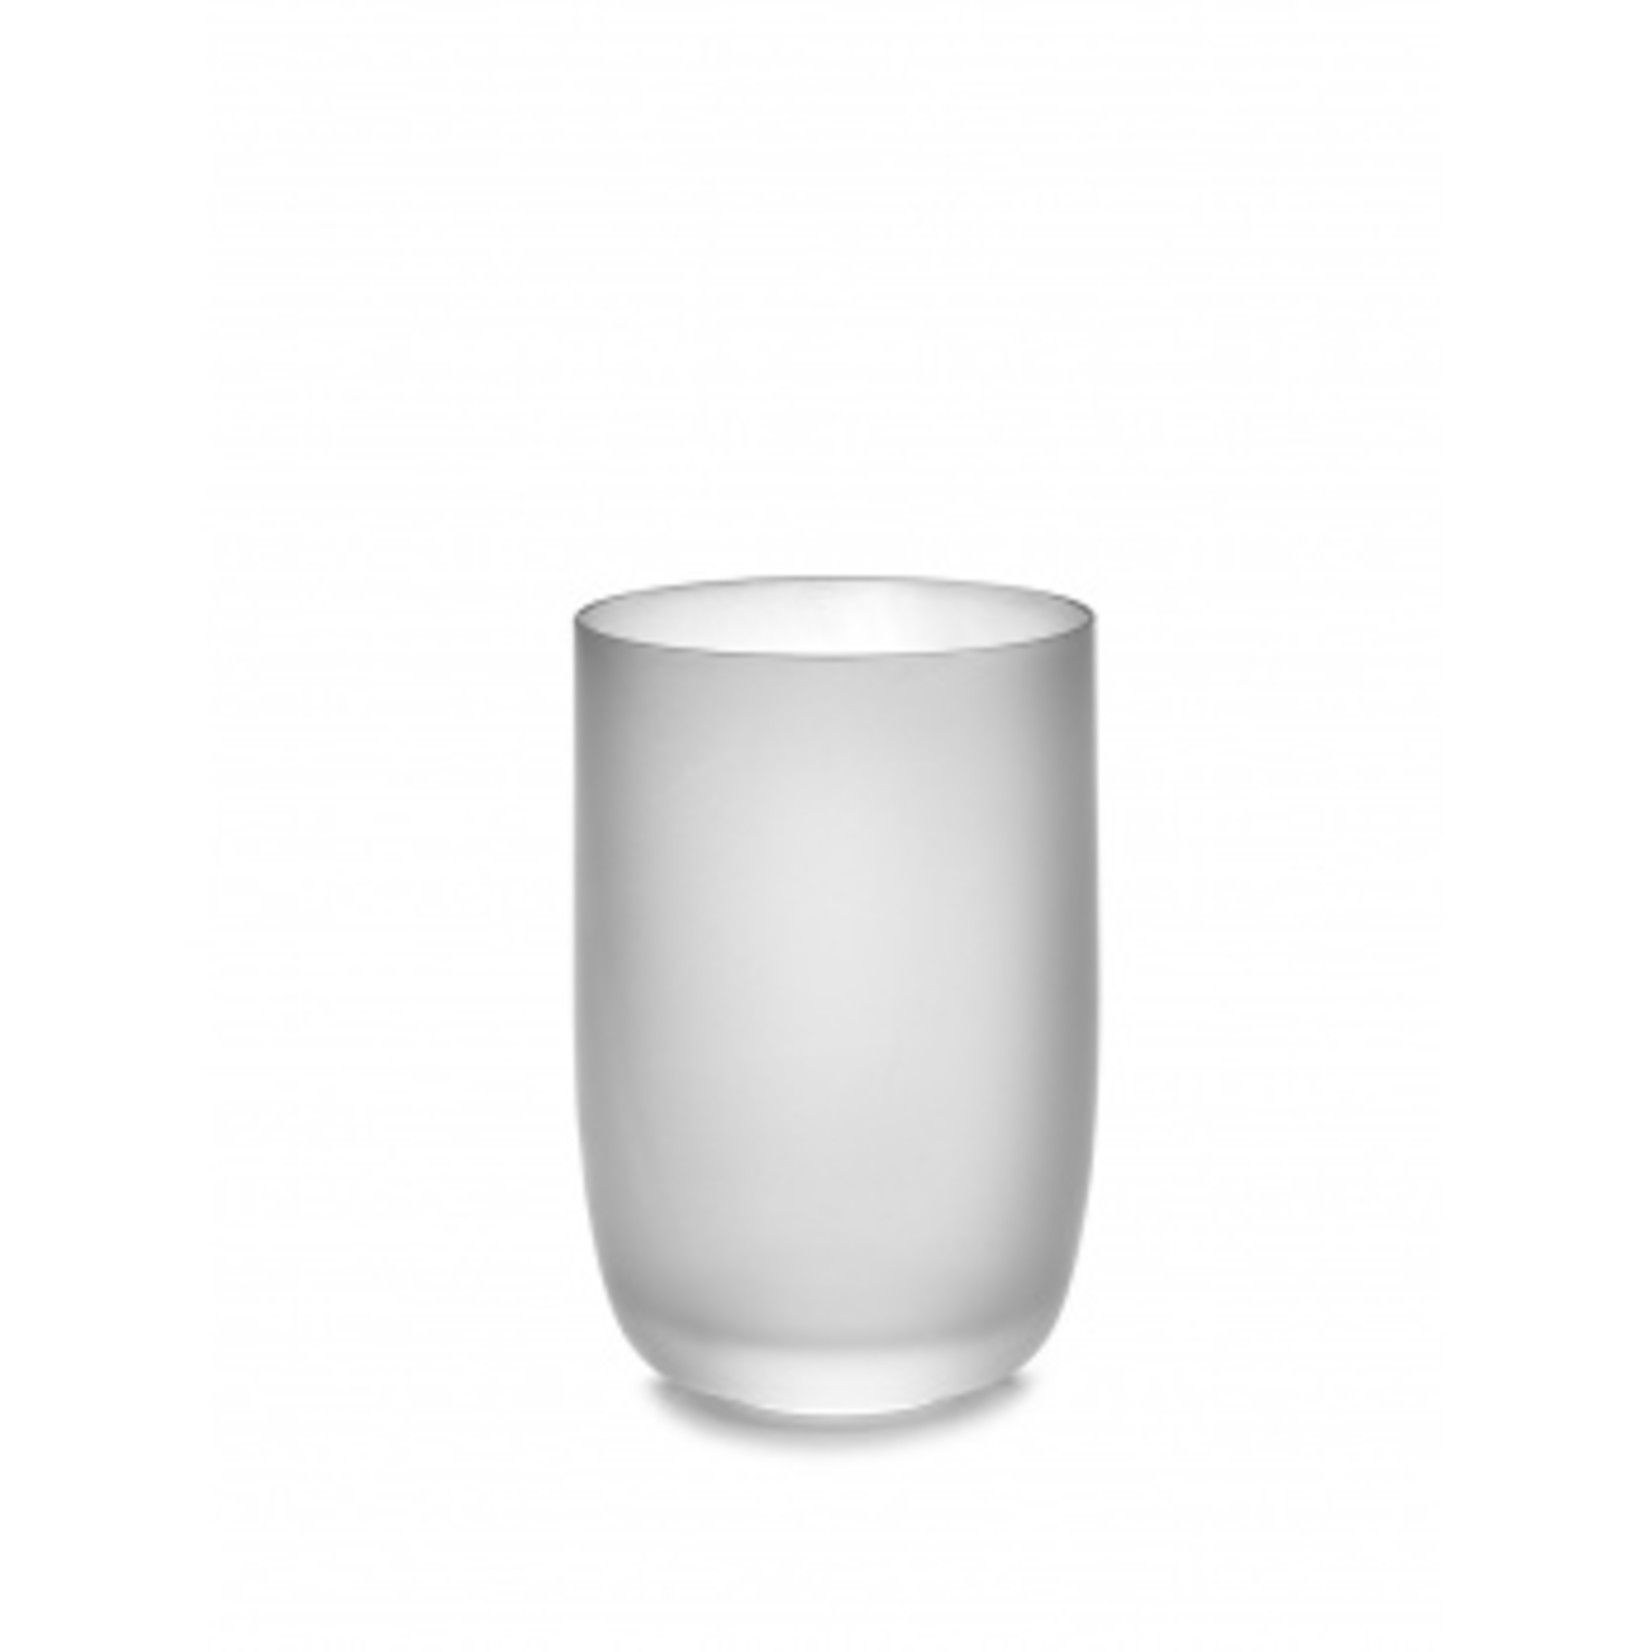 Piet Boon Waterglas Piet Boon mat